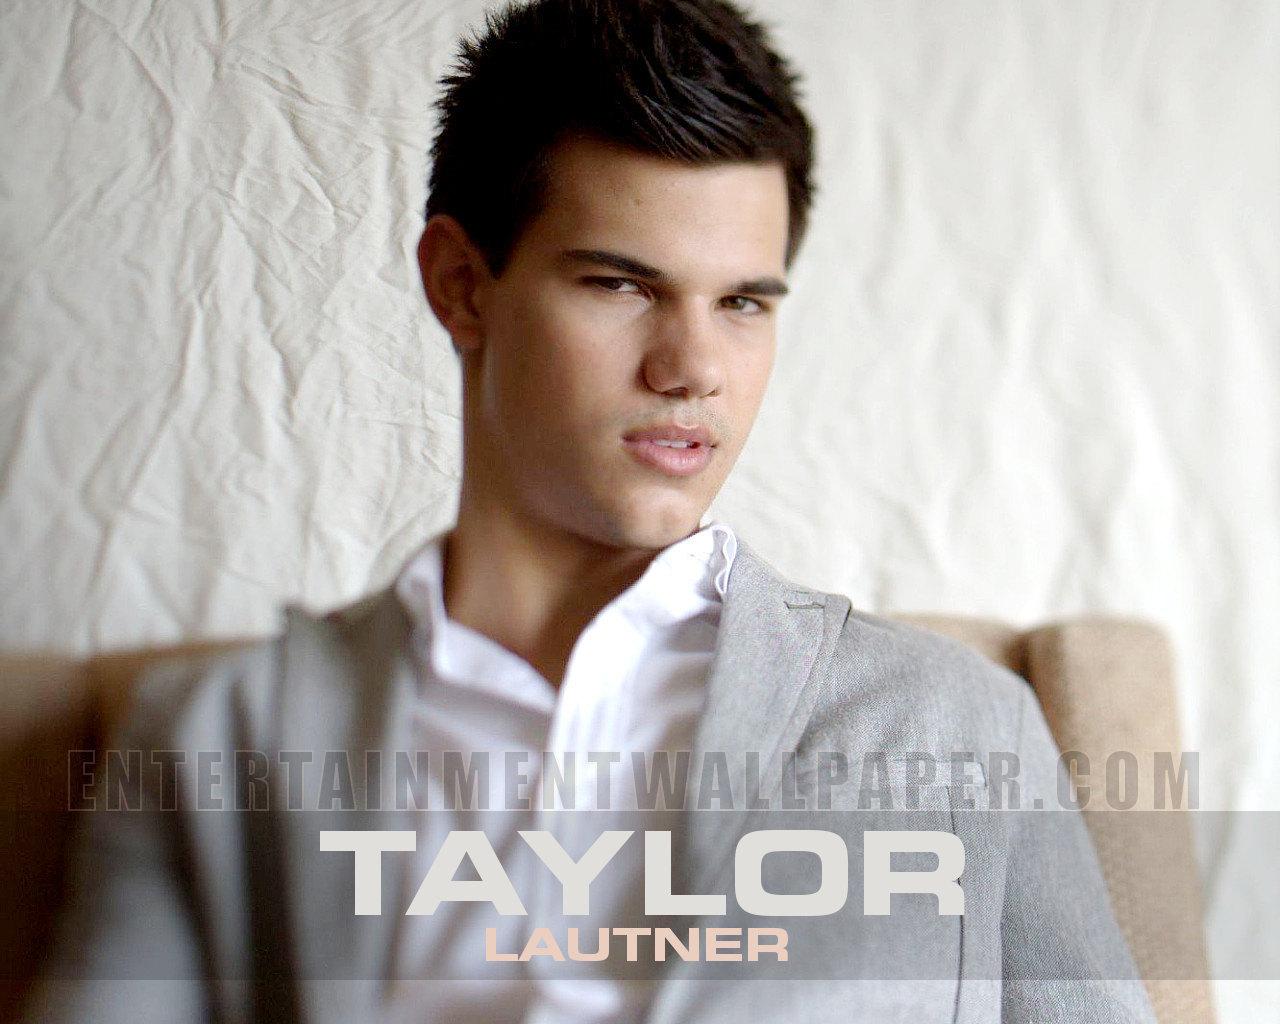 http://2.bp.blogspot.com/_v86pN0tym4k/TM6y4qqn1NI/AAAAAAAAESw/-2Q82wRvT74/s1600/Taylor-Lautner-taylor-lautner-12054471-1280-1024.jpg